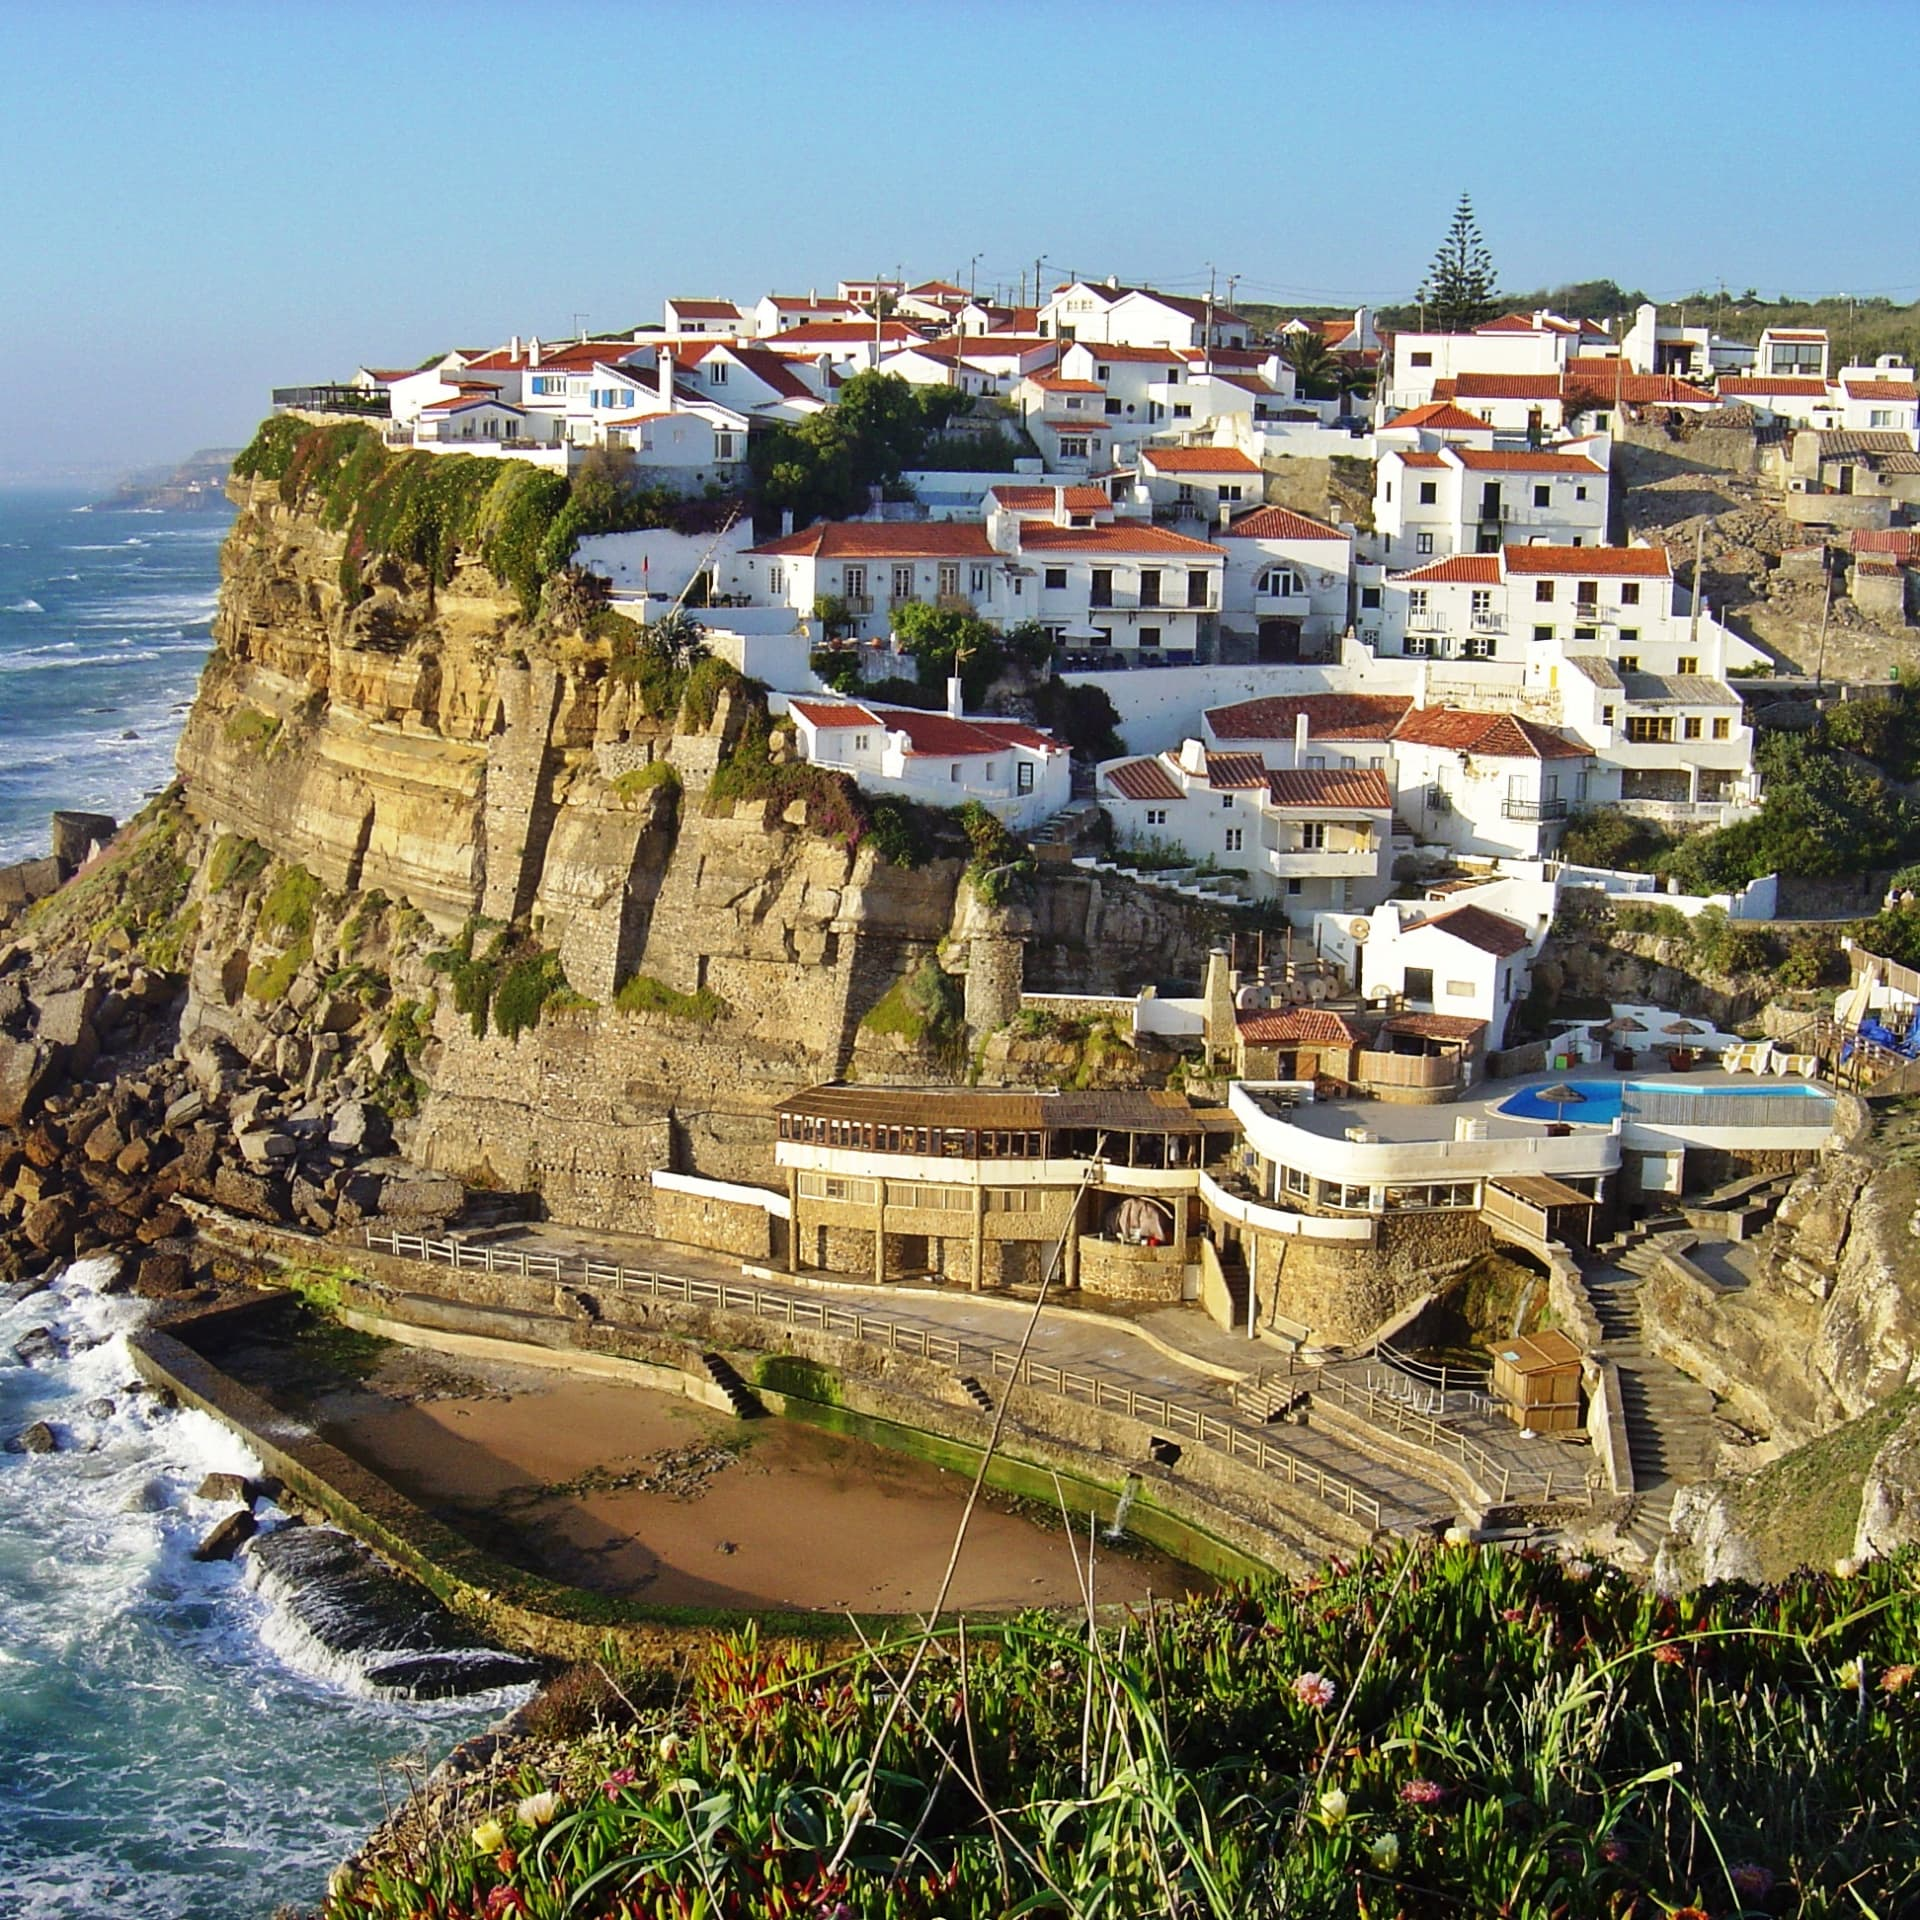 The hilltop village ofAzenhas do Mar, along with the coast of Colares. Photo credit:Leoboudv.